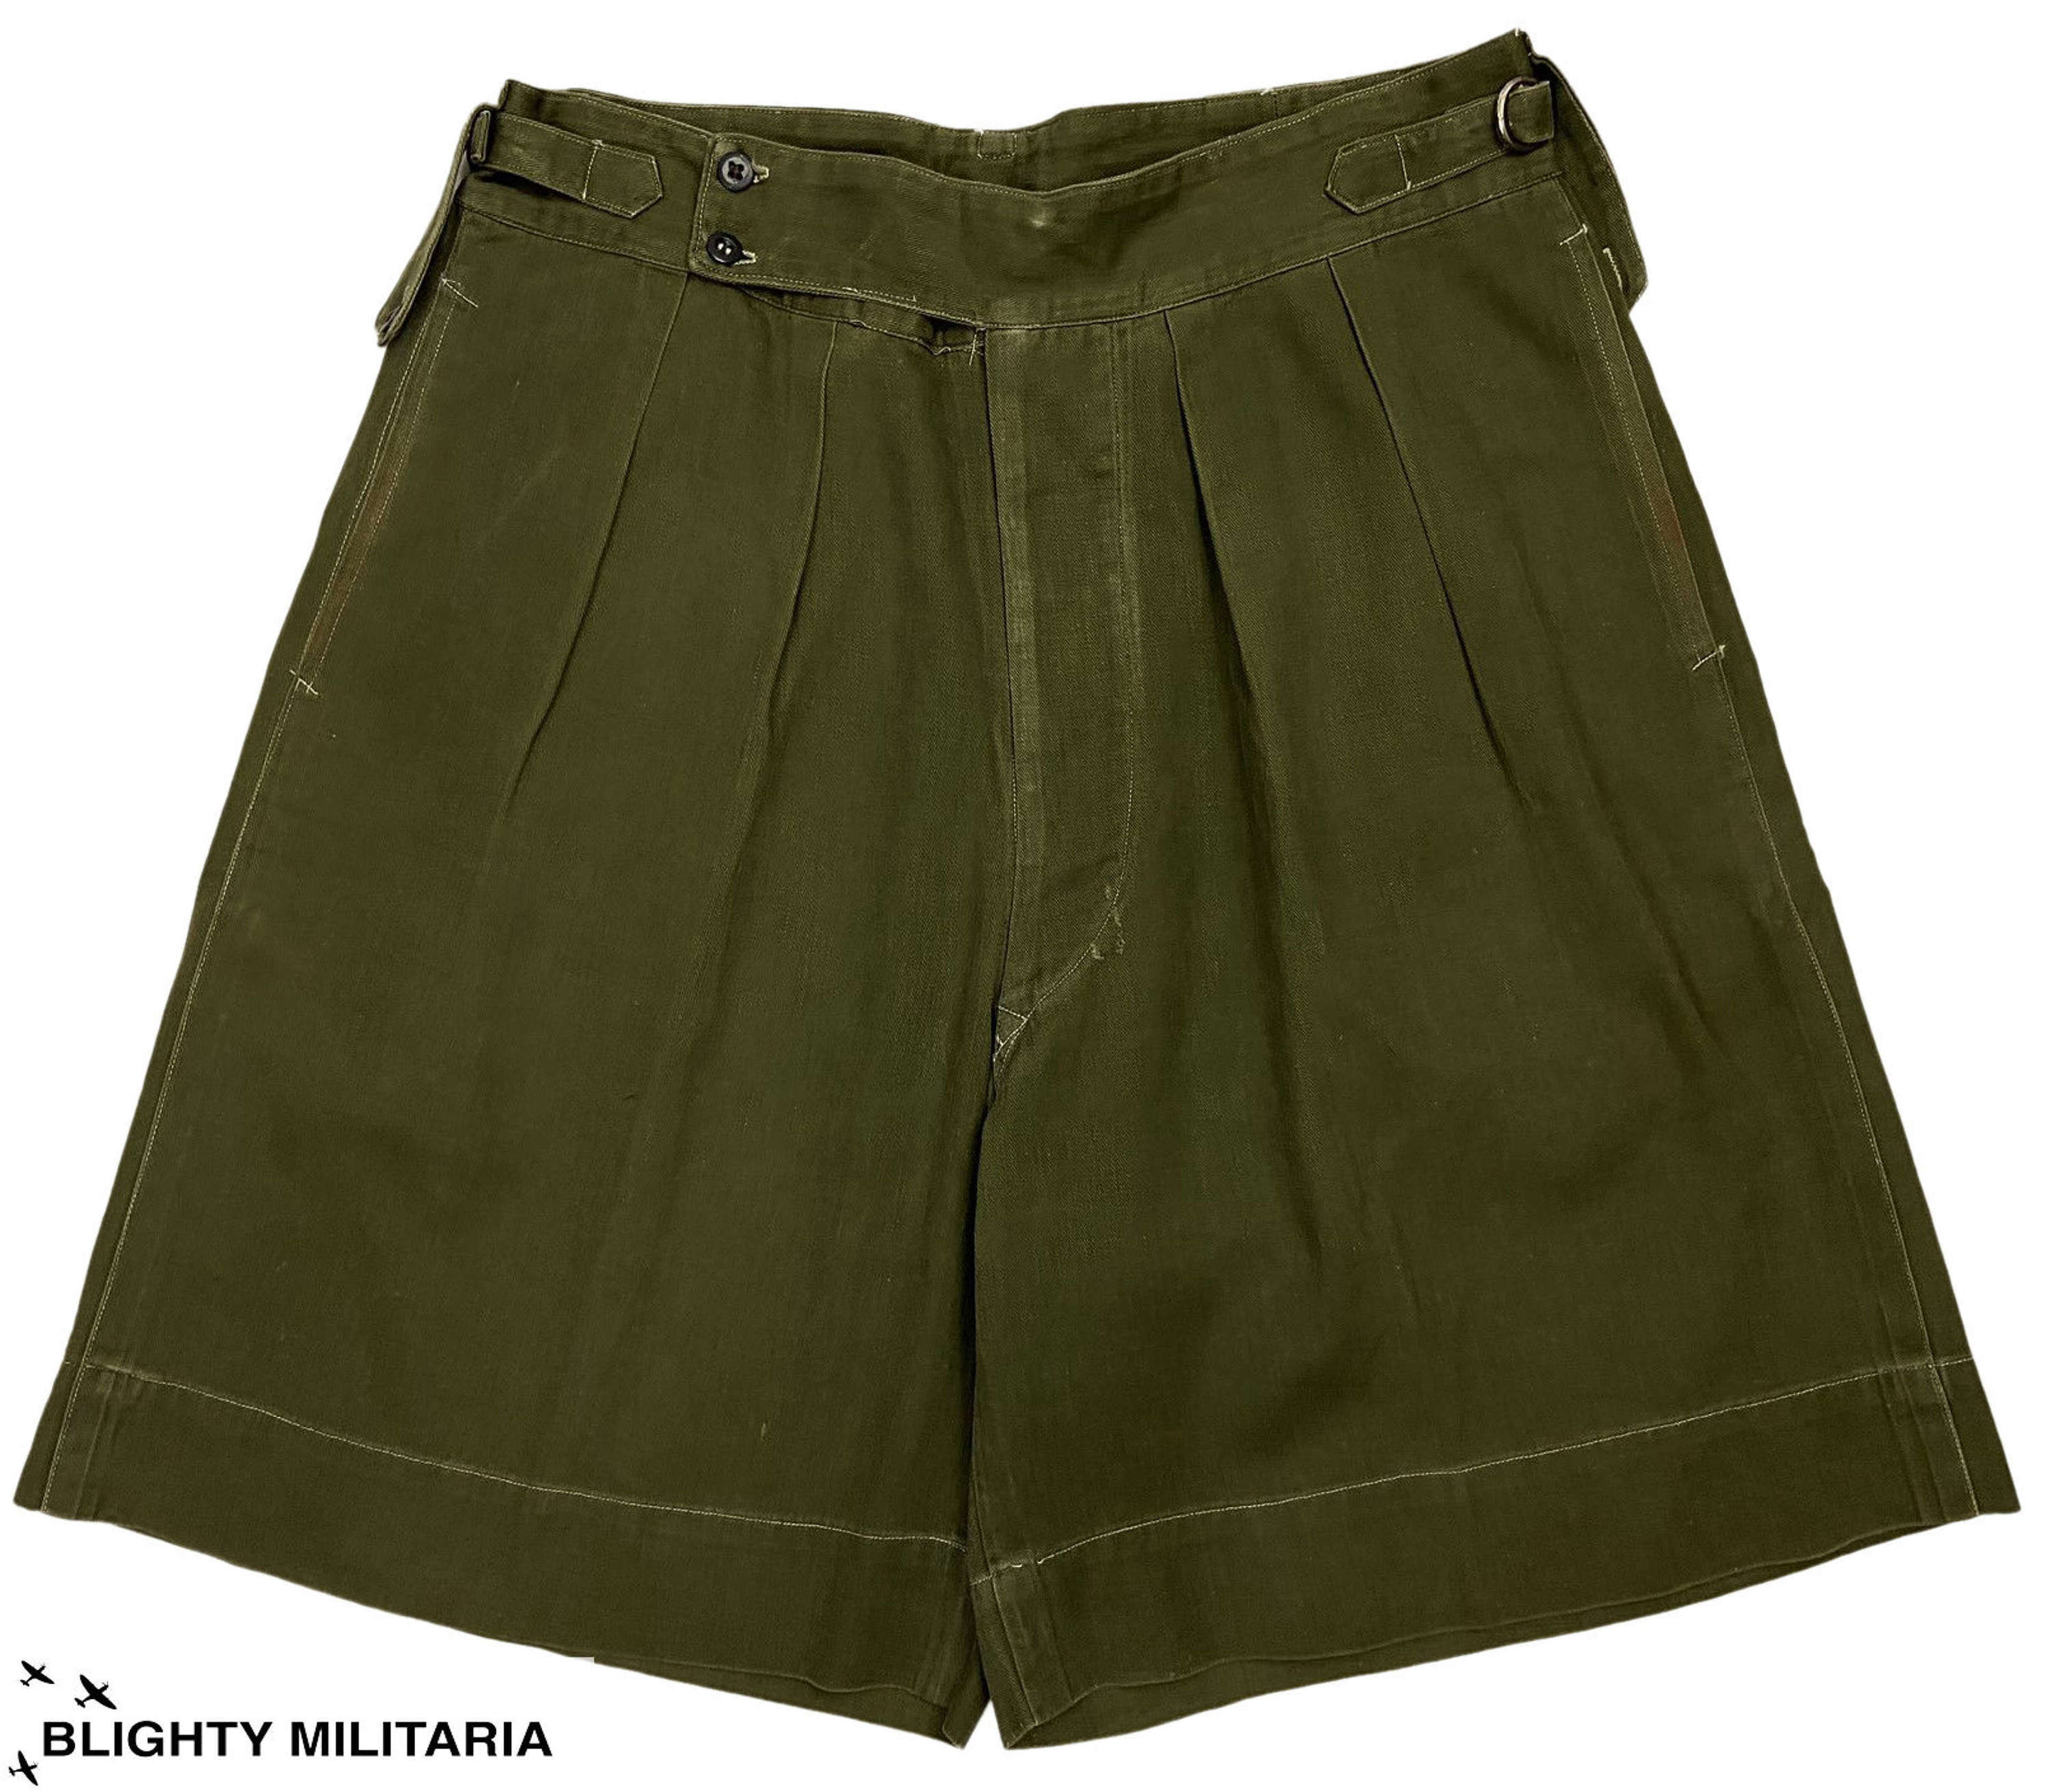 Original 1950s British Jungle Green Shorts - Size 33